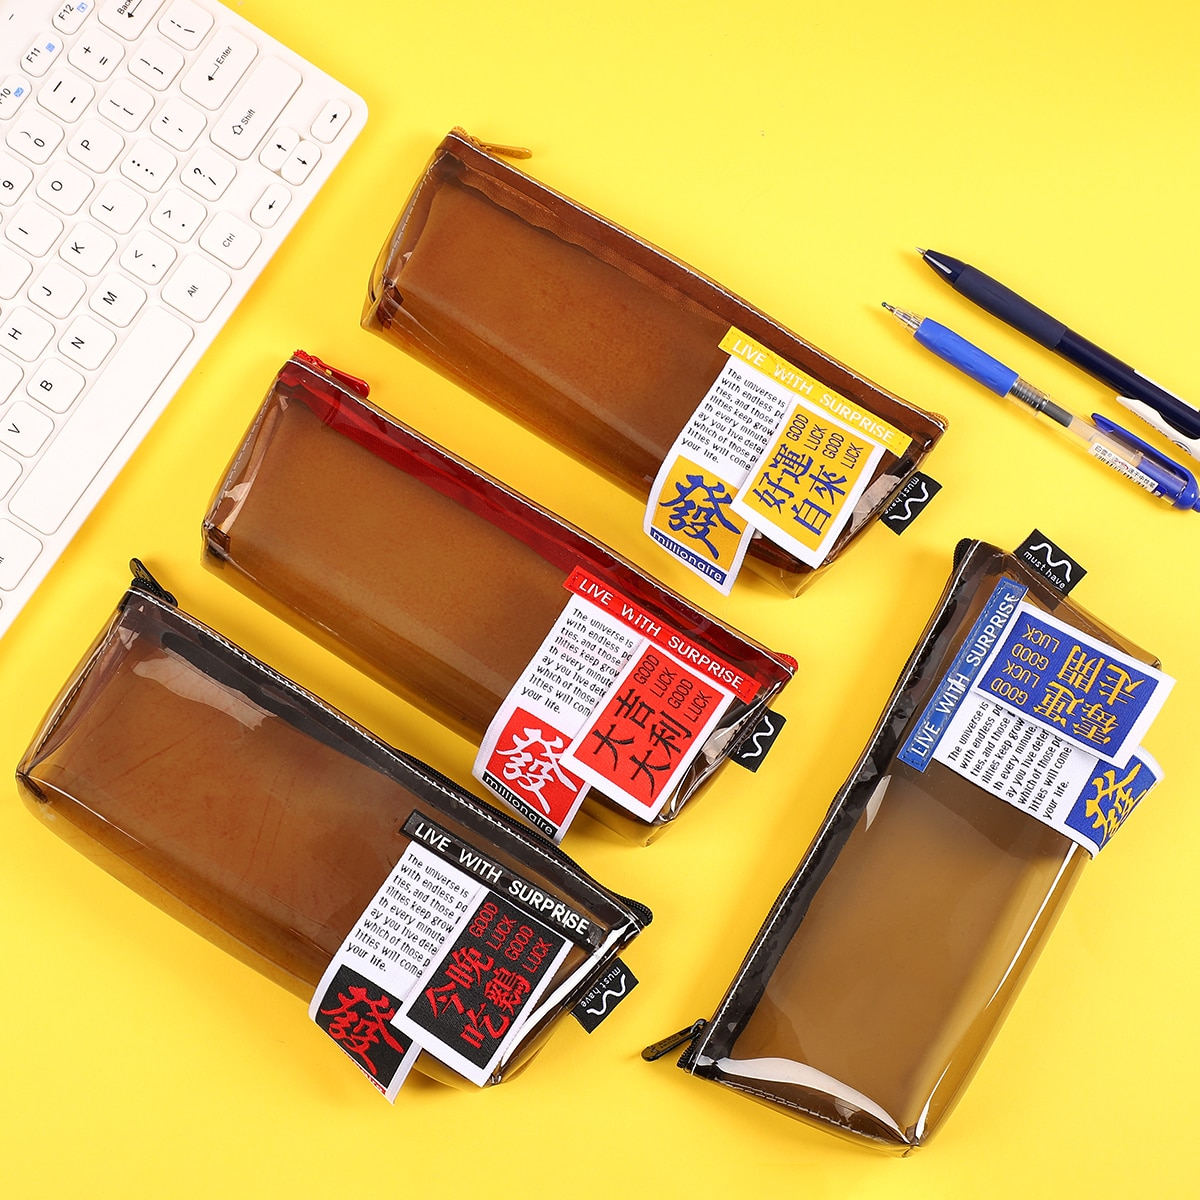 JIANWU 1PC Kawaii Retro fashion Triangle Pencil Case Good luck money Waterproof TPU Leather Pen Bag School Stationery